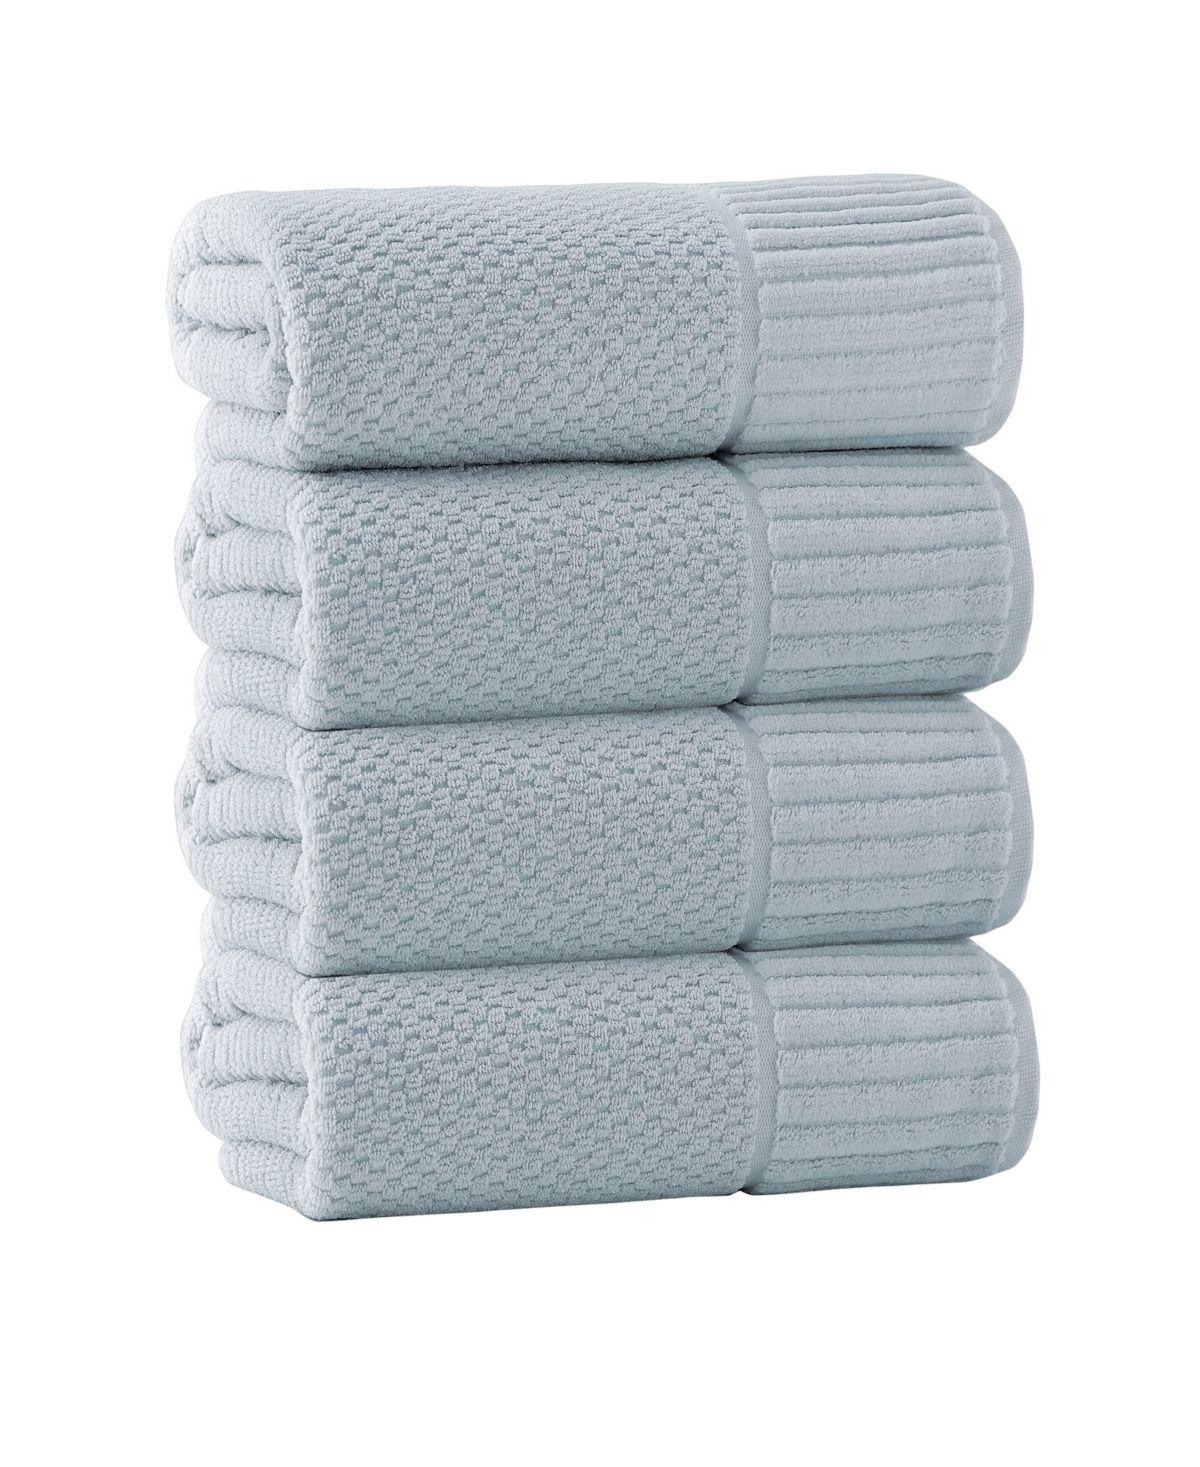 Enchante Home Timaru Turkish Cotton Bath Towel Collection